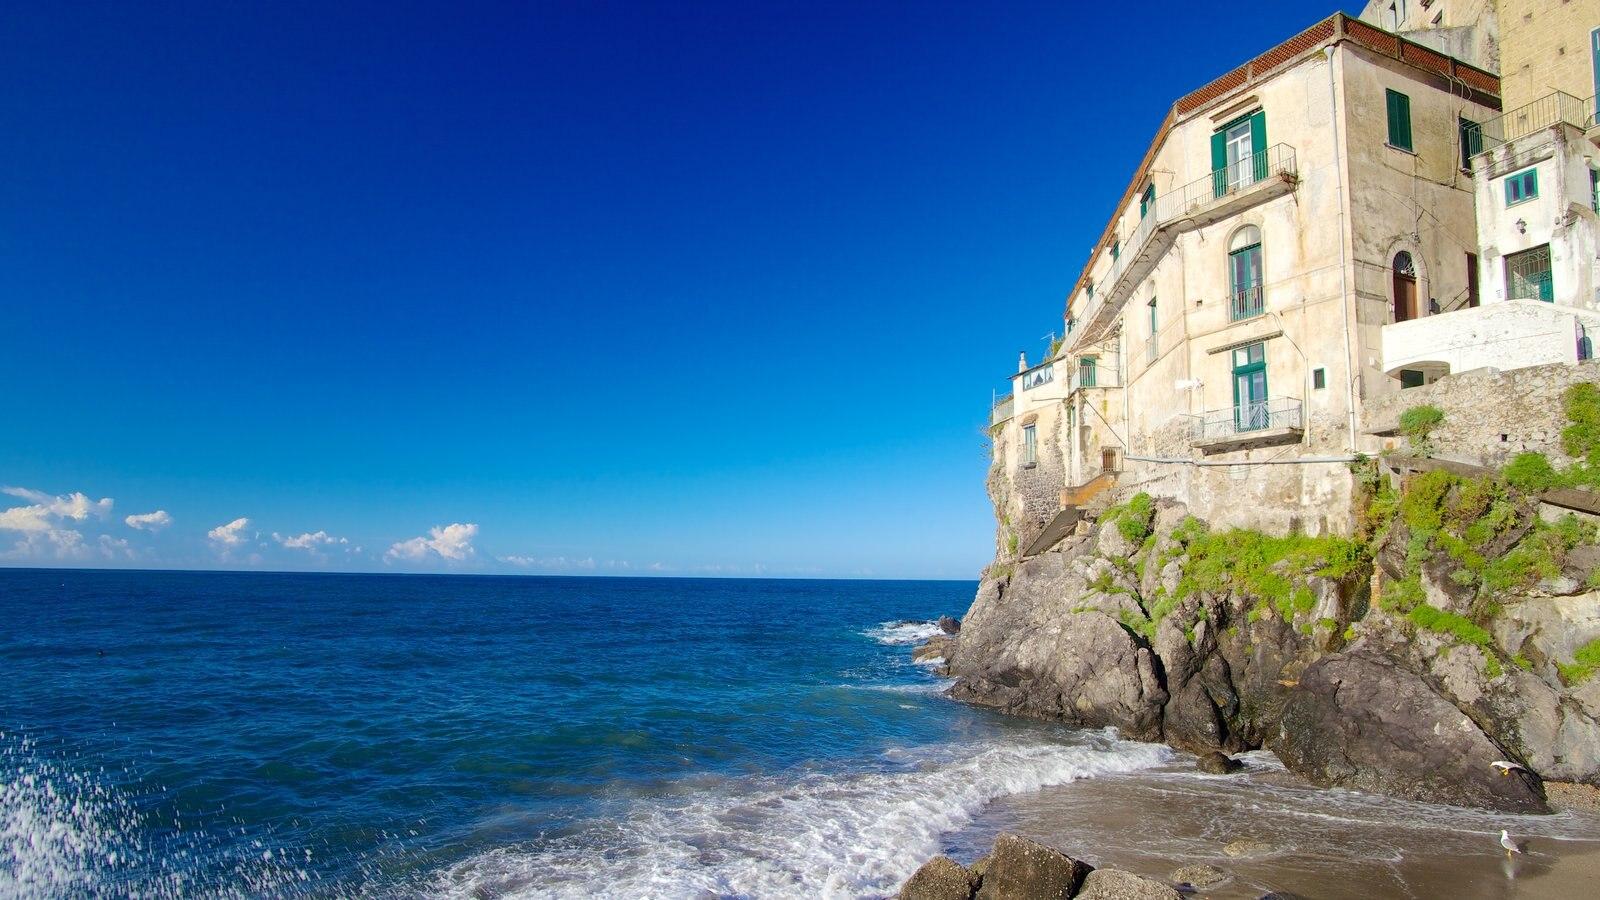 Minori featuring rugged coastline and a coastal town